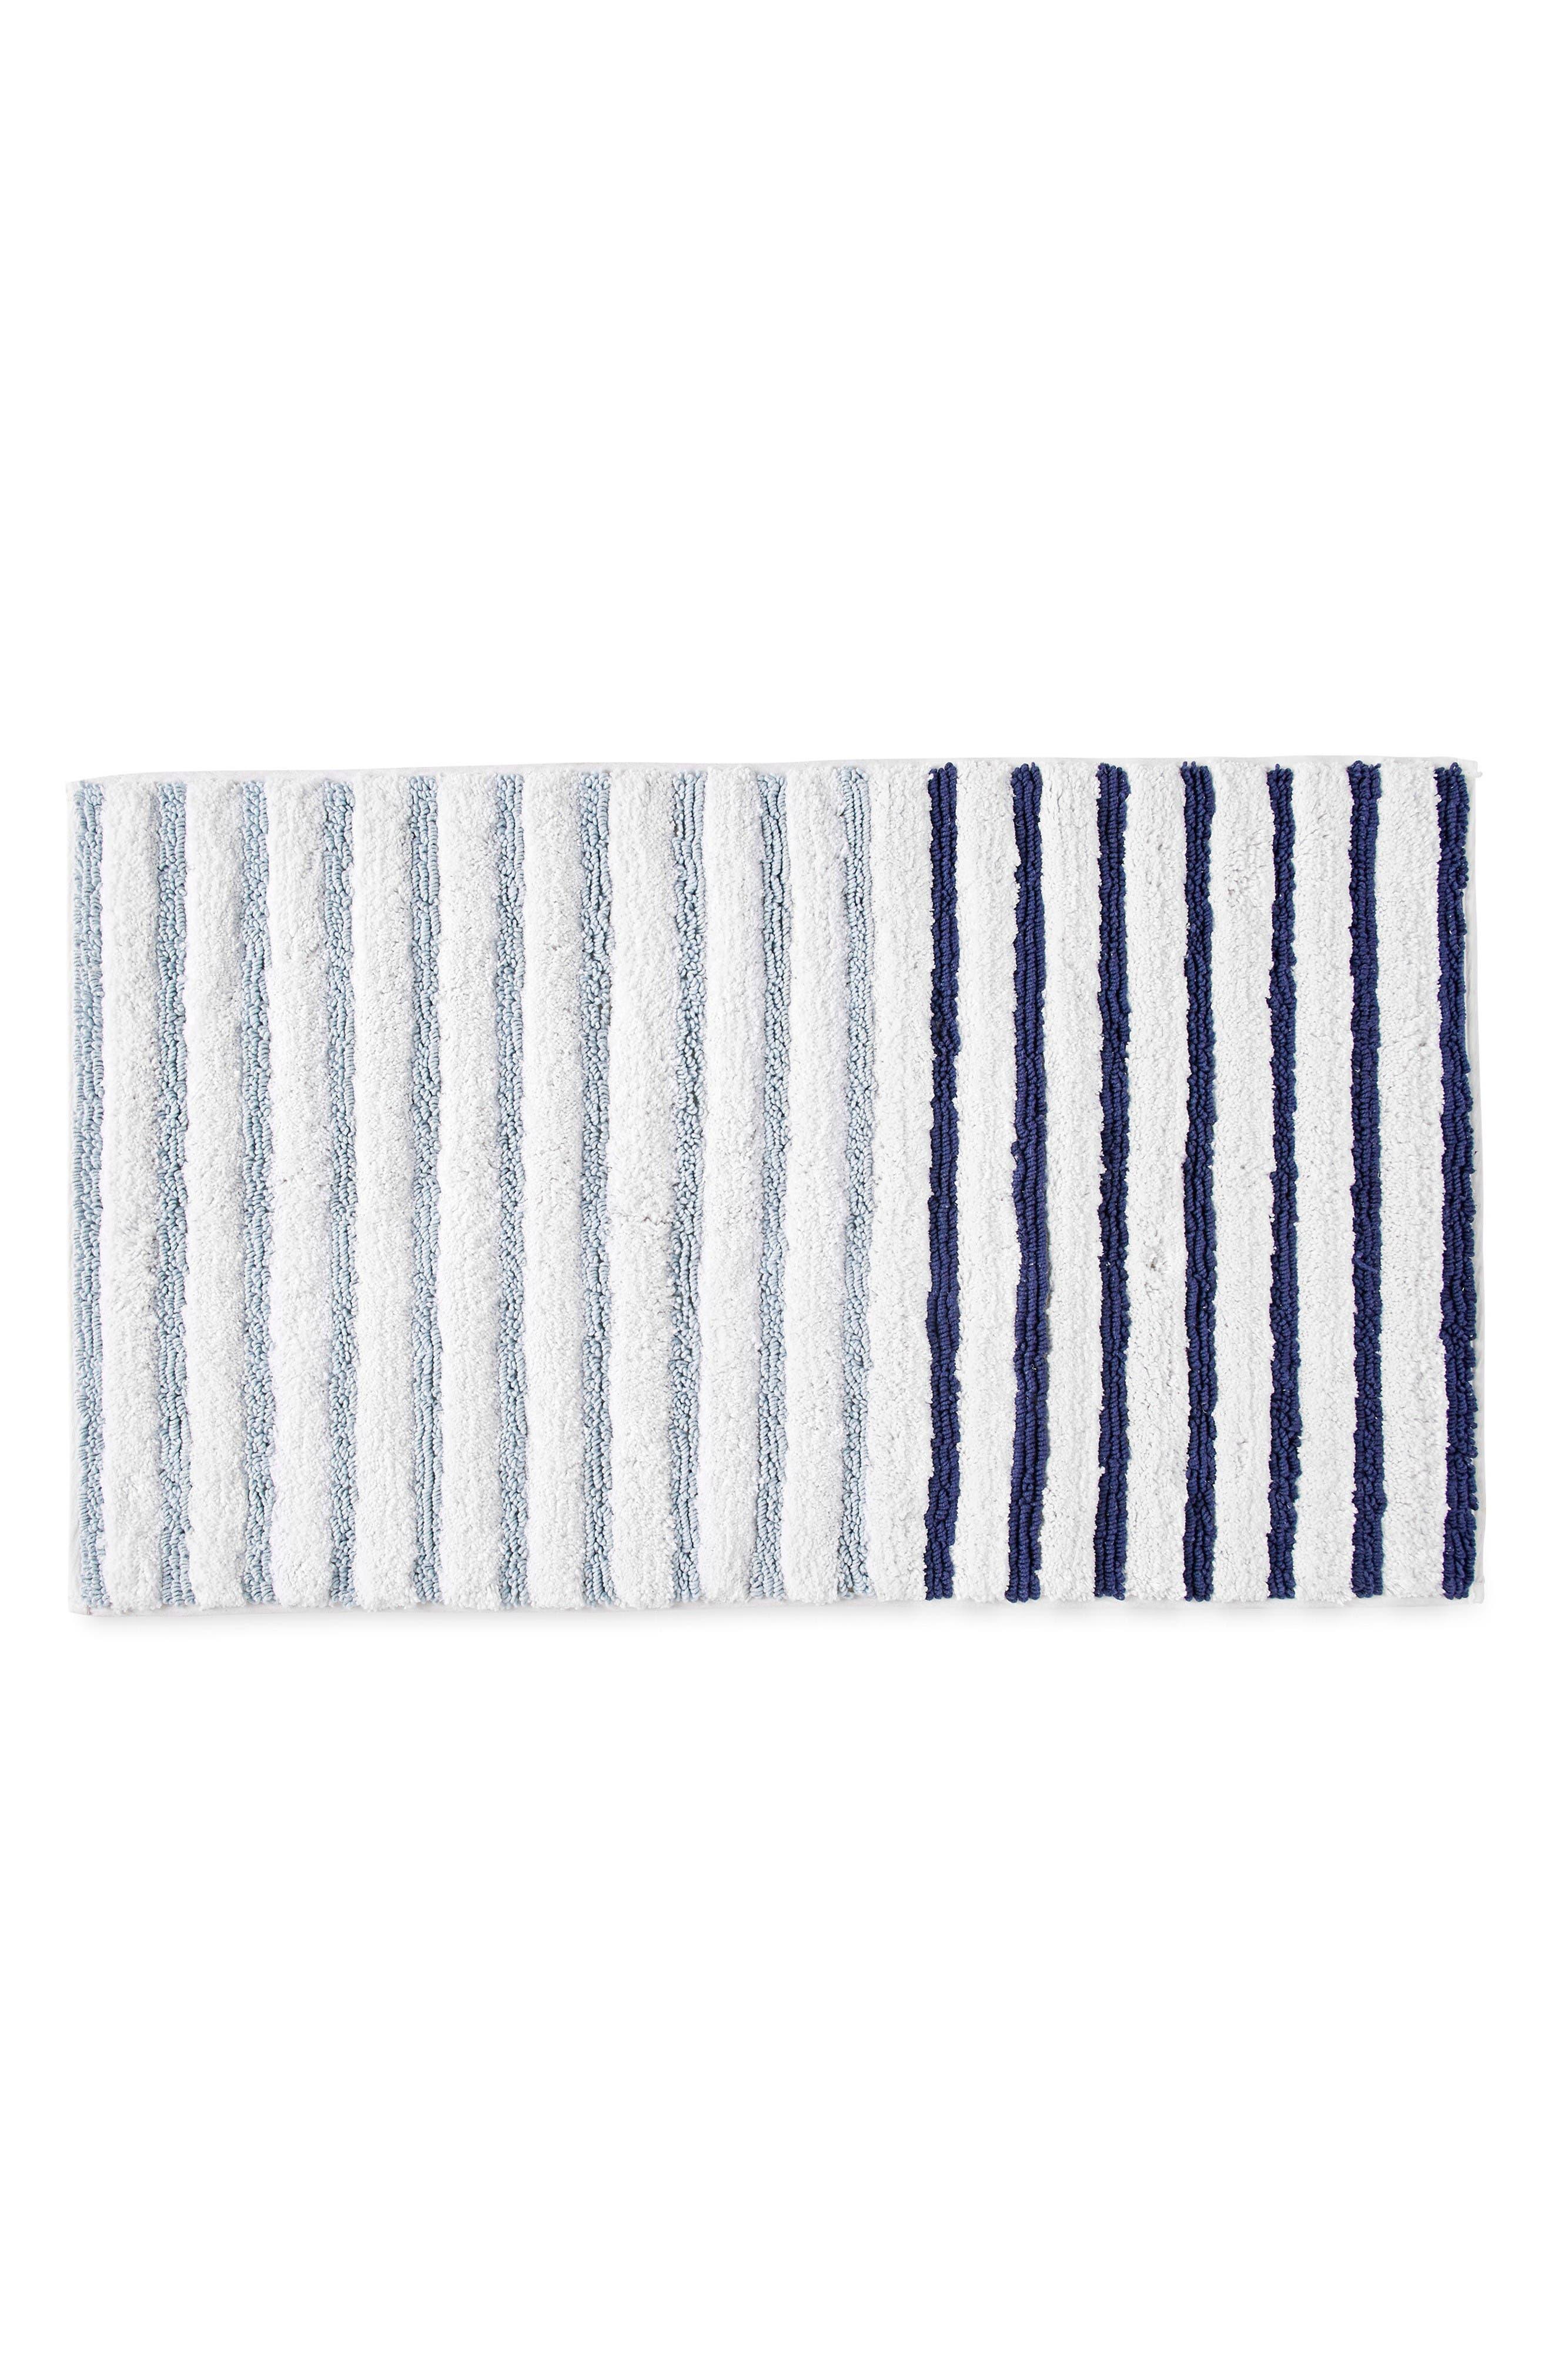 Parson Stripe Bath Rug,                             Main thumbnail 1, color,                             Blue Aire